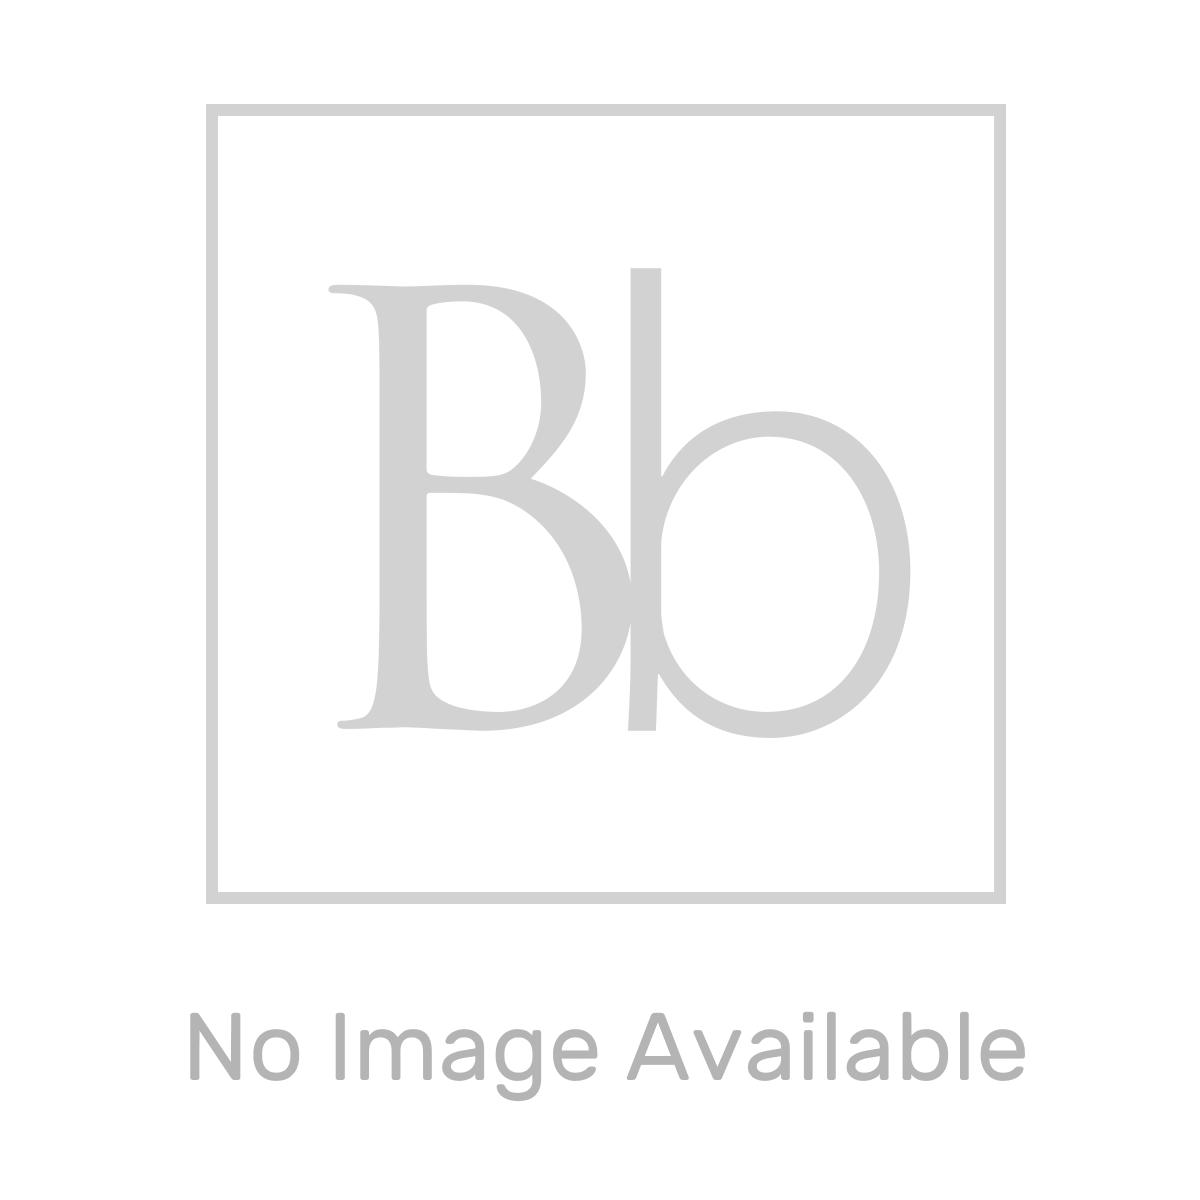 Ikoma White Gloss Vanity Unit with Basin 650mm